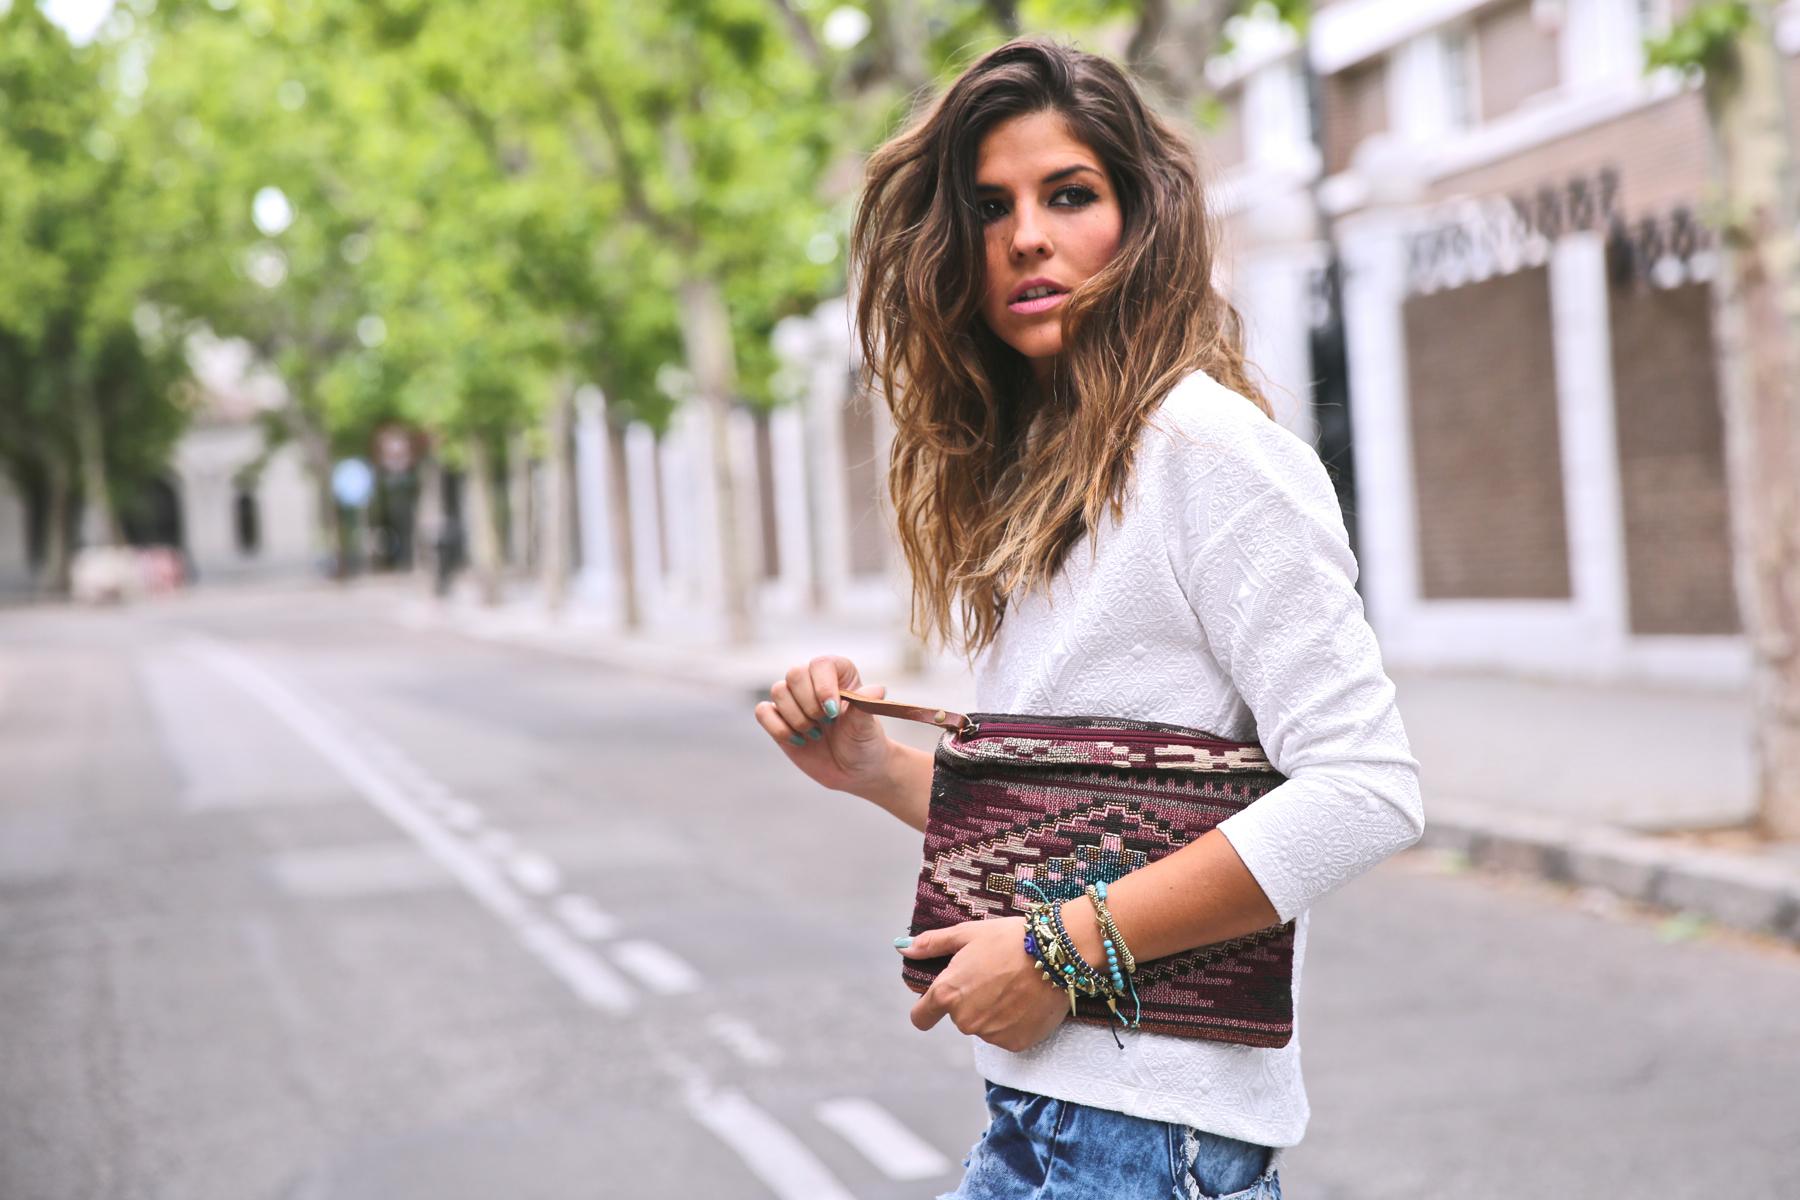 trendy_taste-look-outfit-street_style-ootd-blog-blogger-fashion_spain-moda_españa-denim_shorts-shorts_vaqueros-top_blanco-white_top-sandalias_cordones-ethnic_cluth-clutch_etnico-el_corte_ingles-6